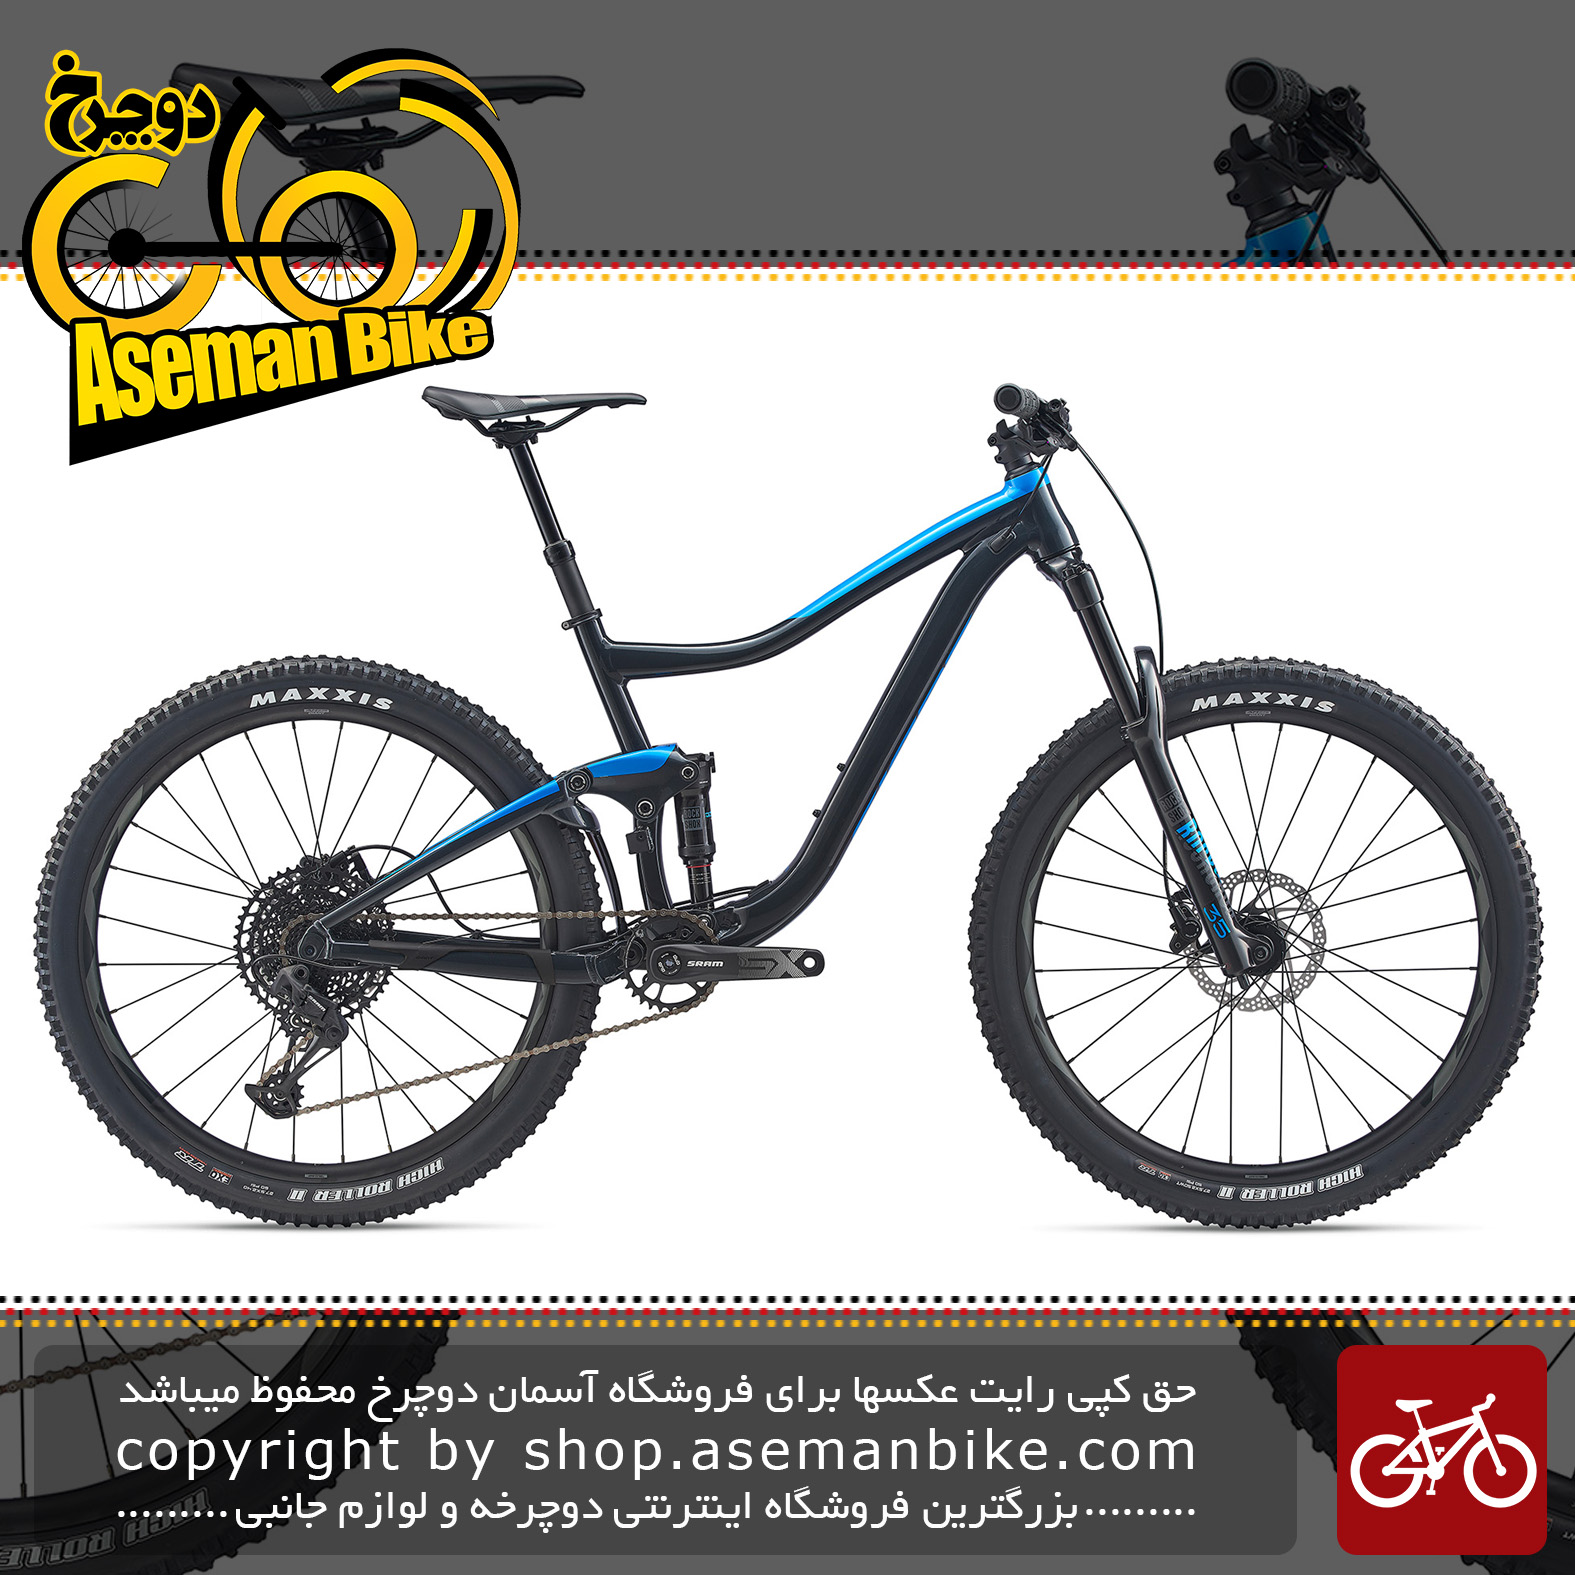 دوچرخه کوهستان جاینت مدل ترنس 3 2020 Giant Mountain Bicycle Trance 3 2020